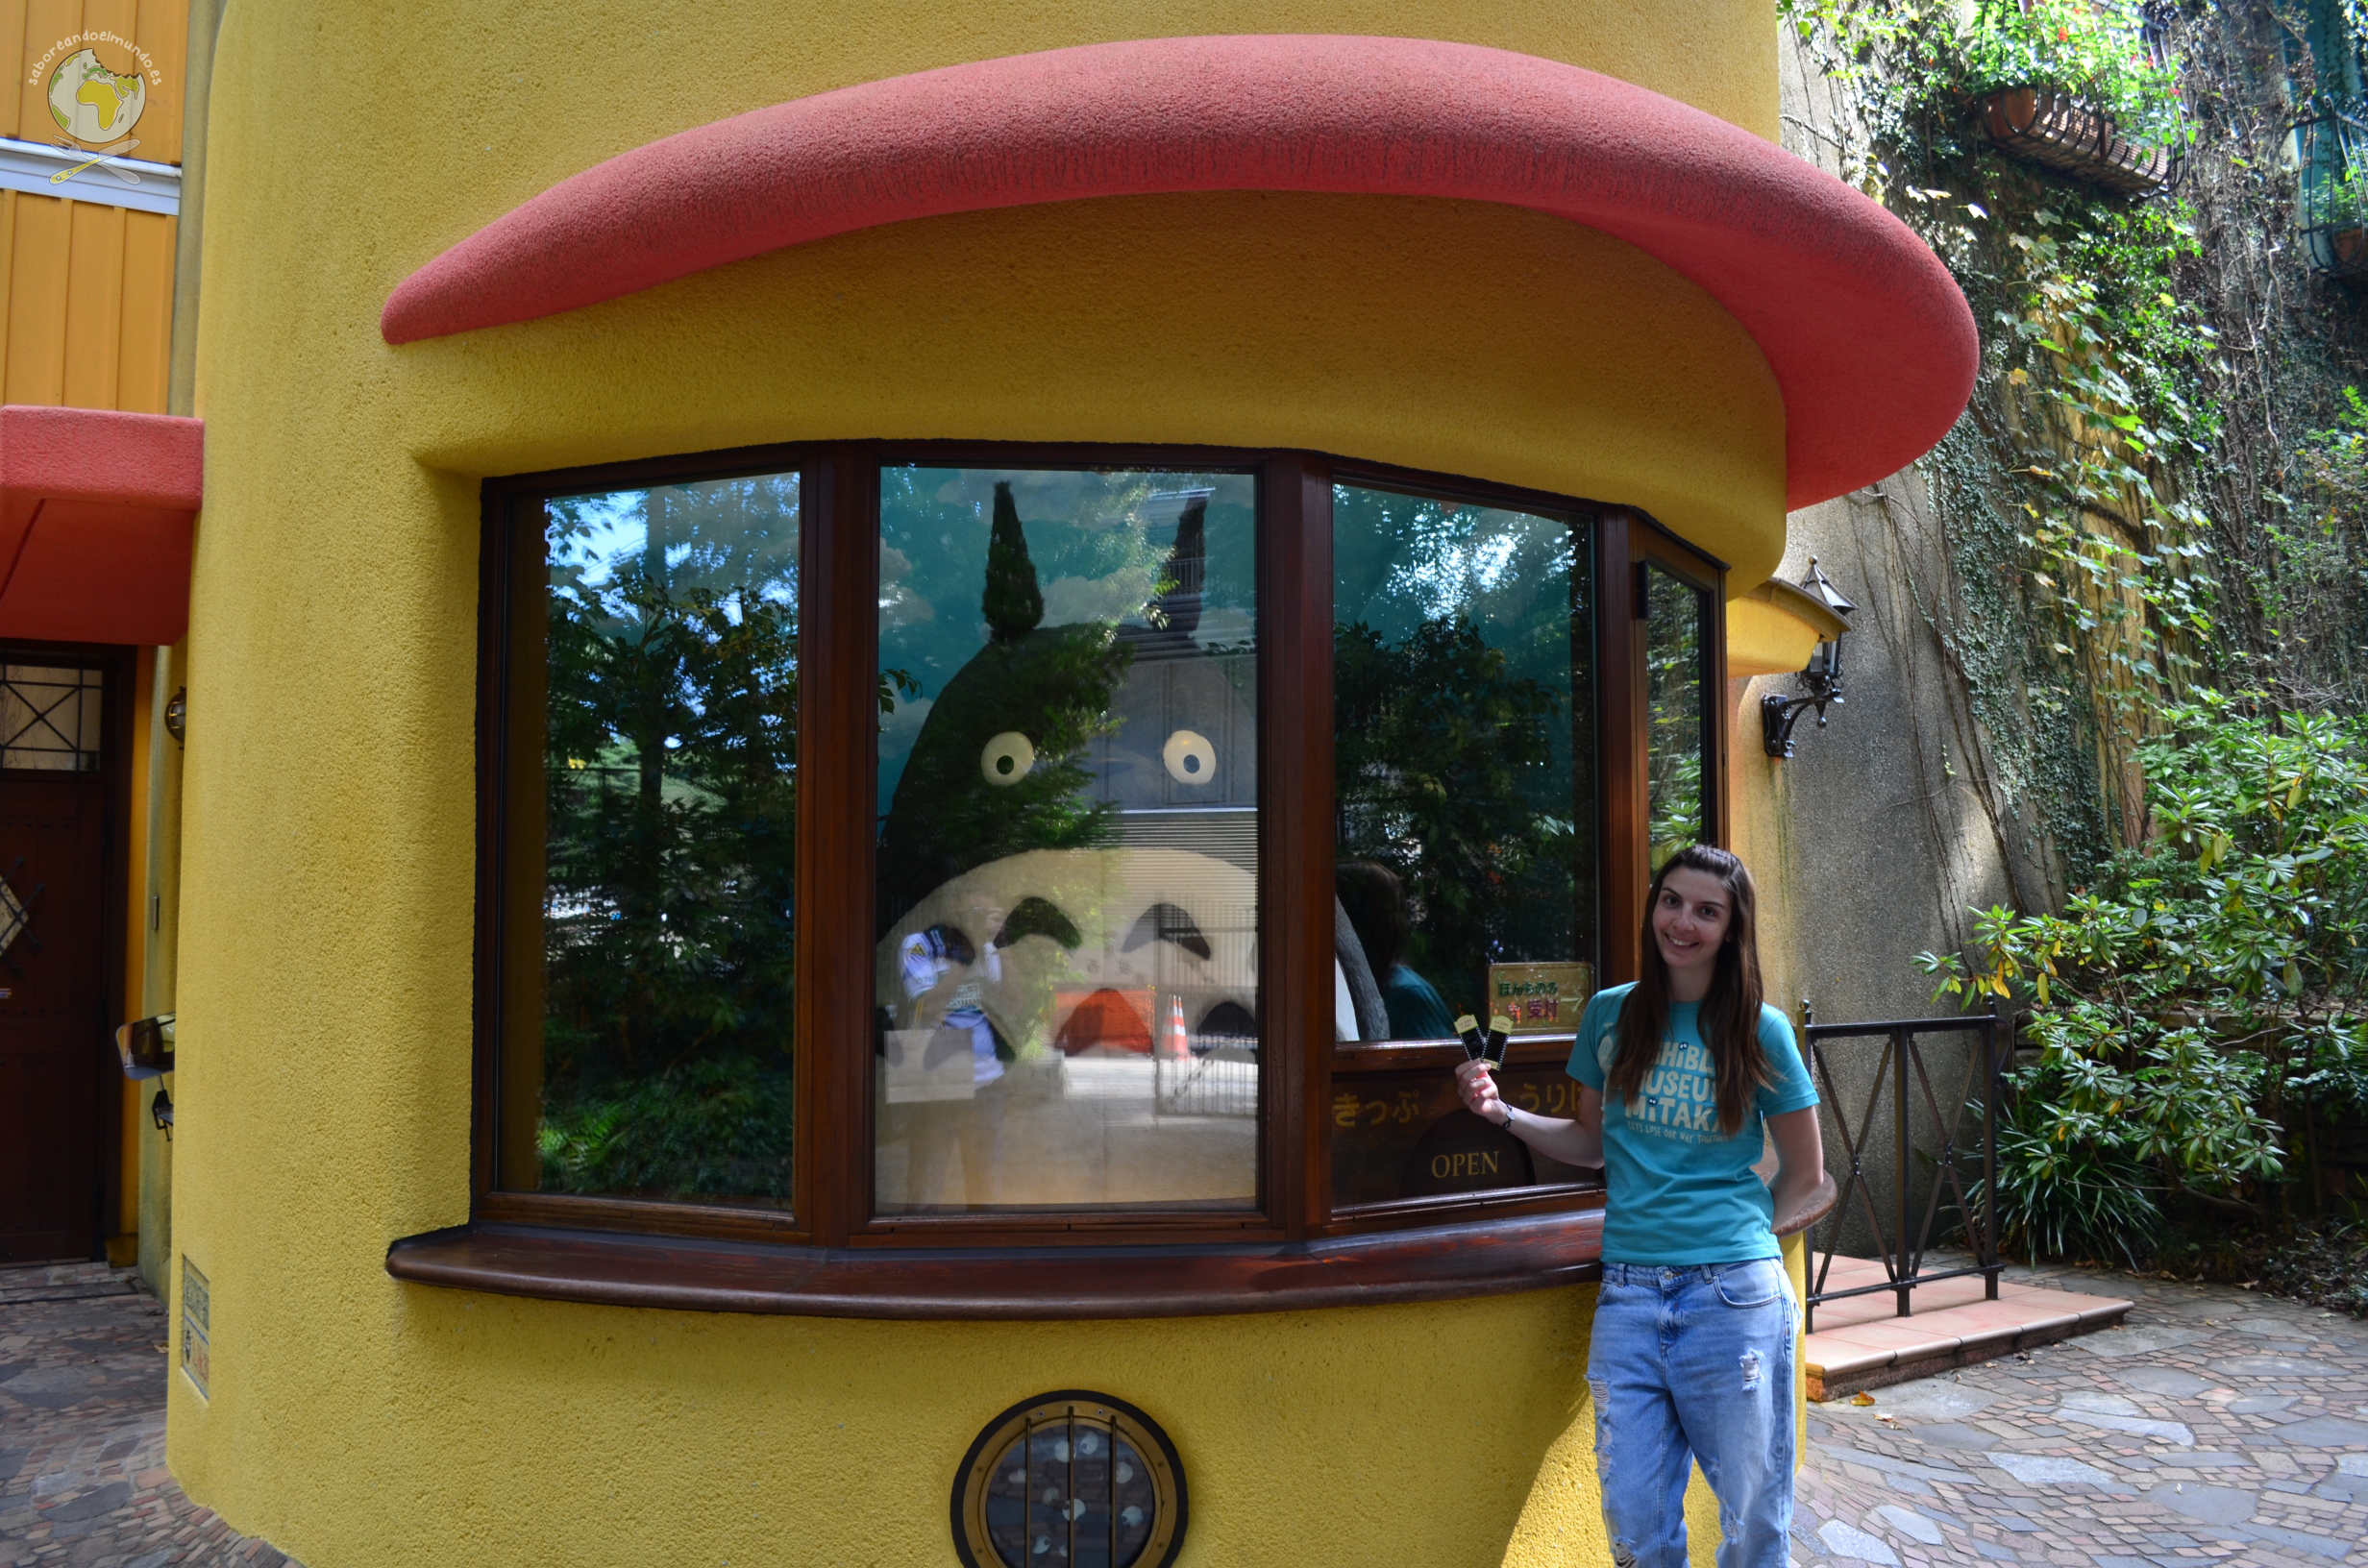 Entrada musei Ghibli Totoro